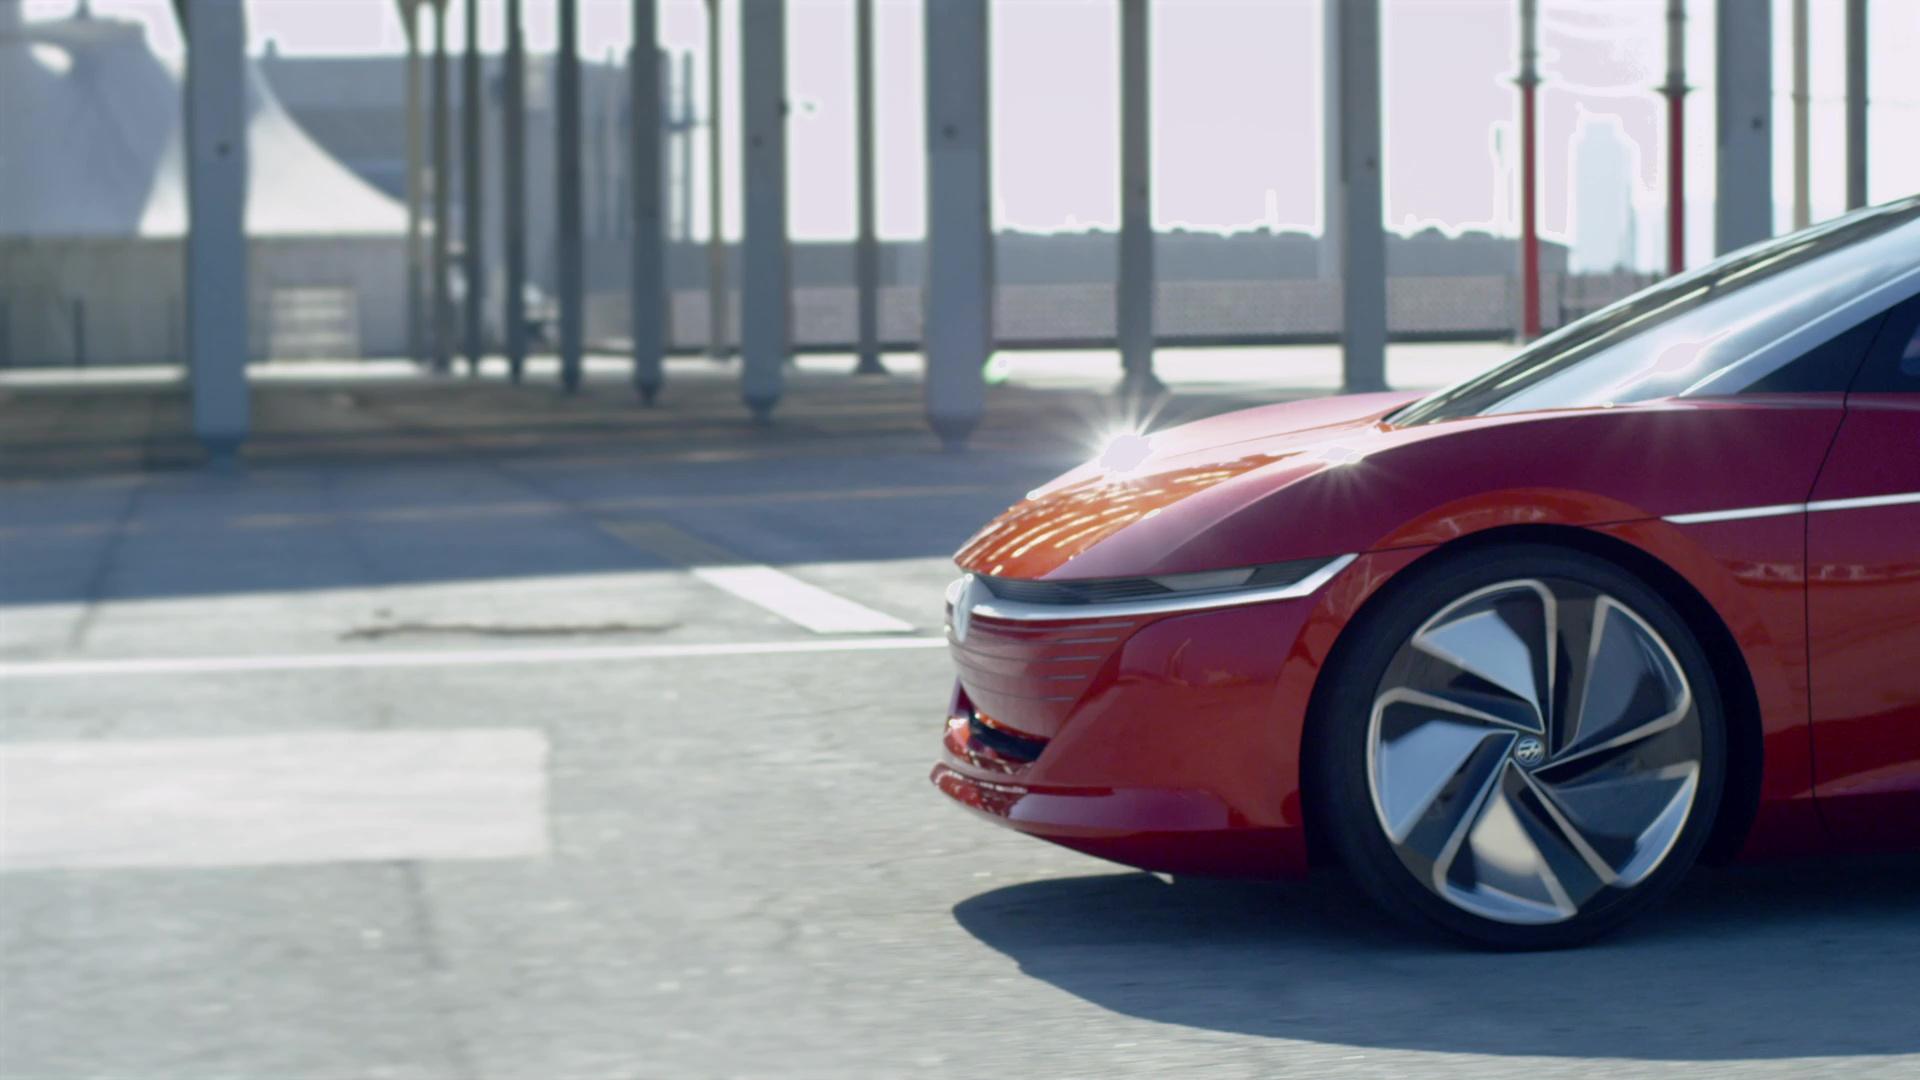 Volkswagen lanzará un modelo eléctrico por menos de 24.000 euros